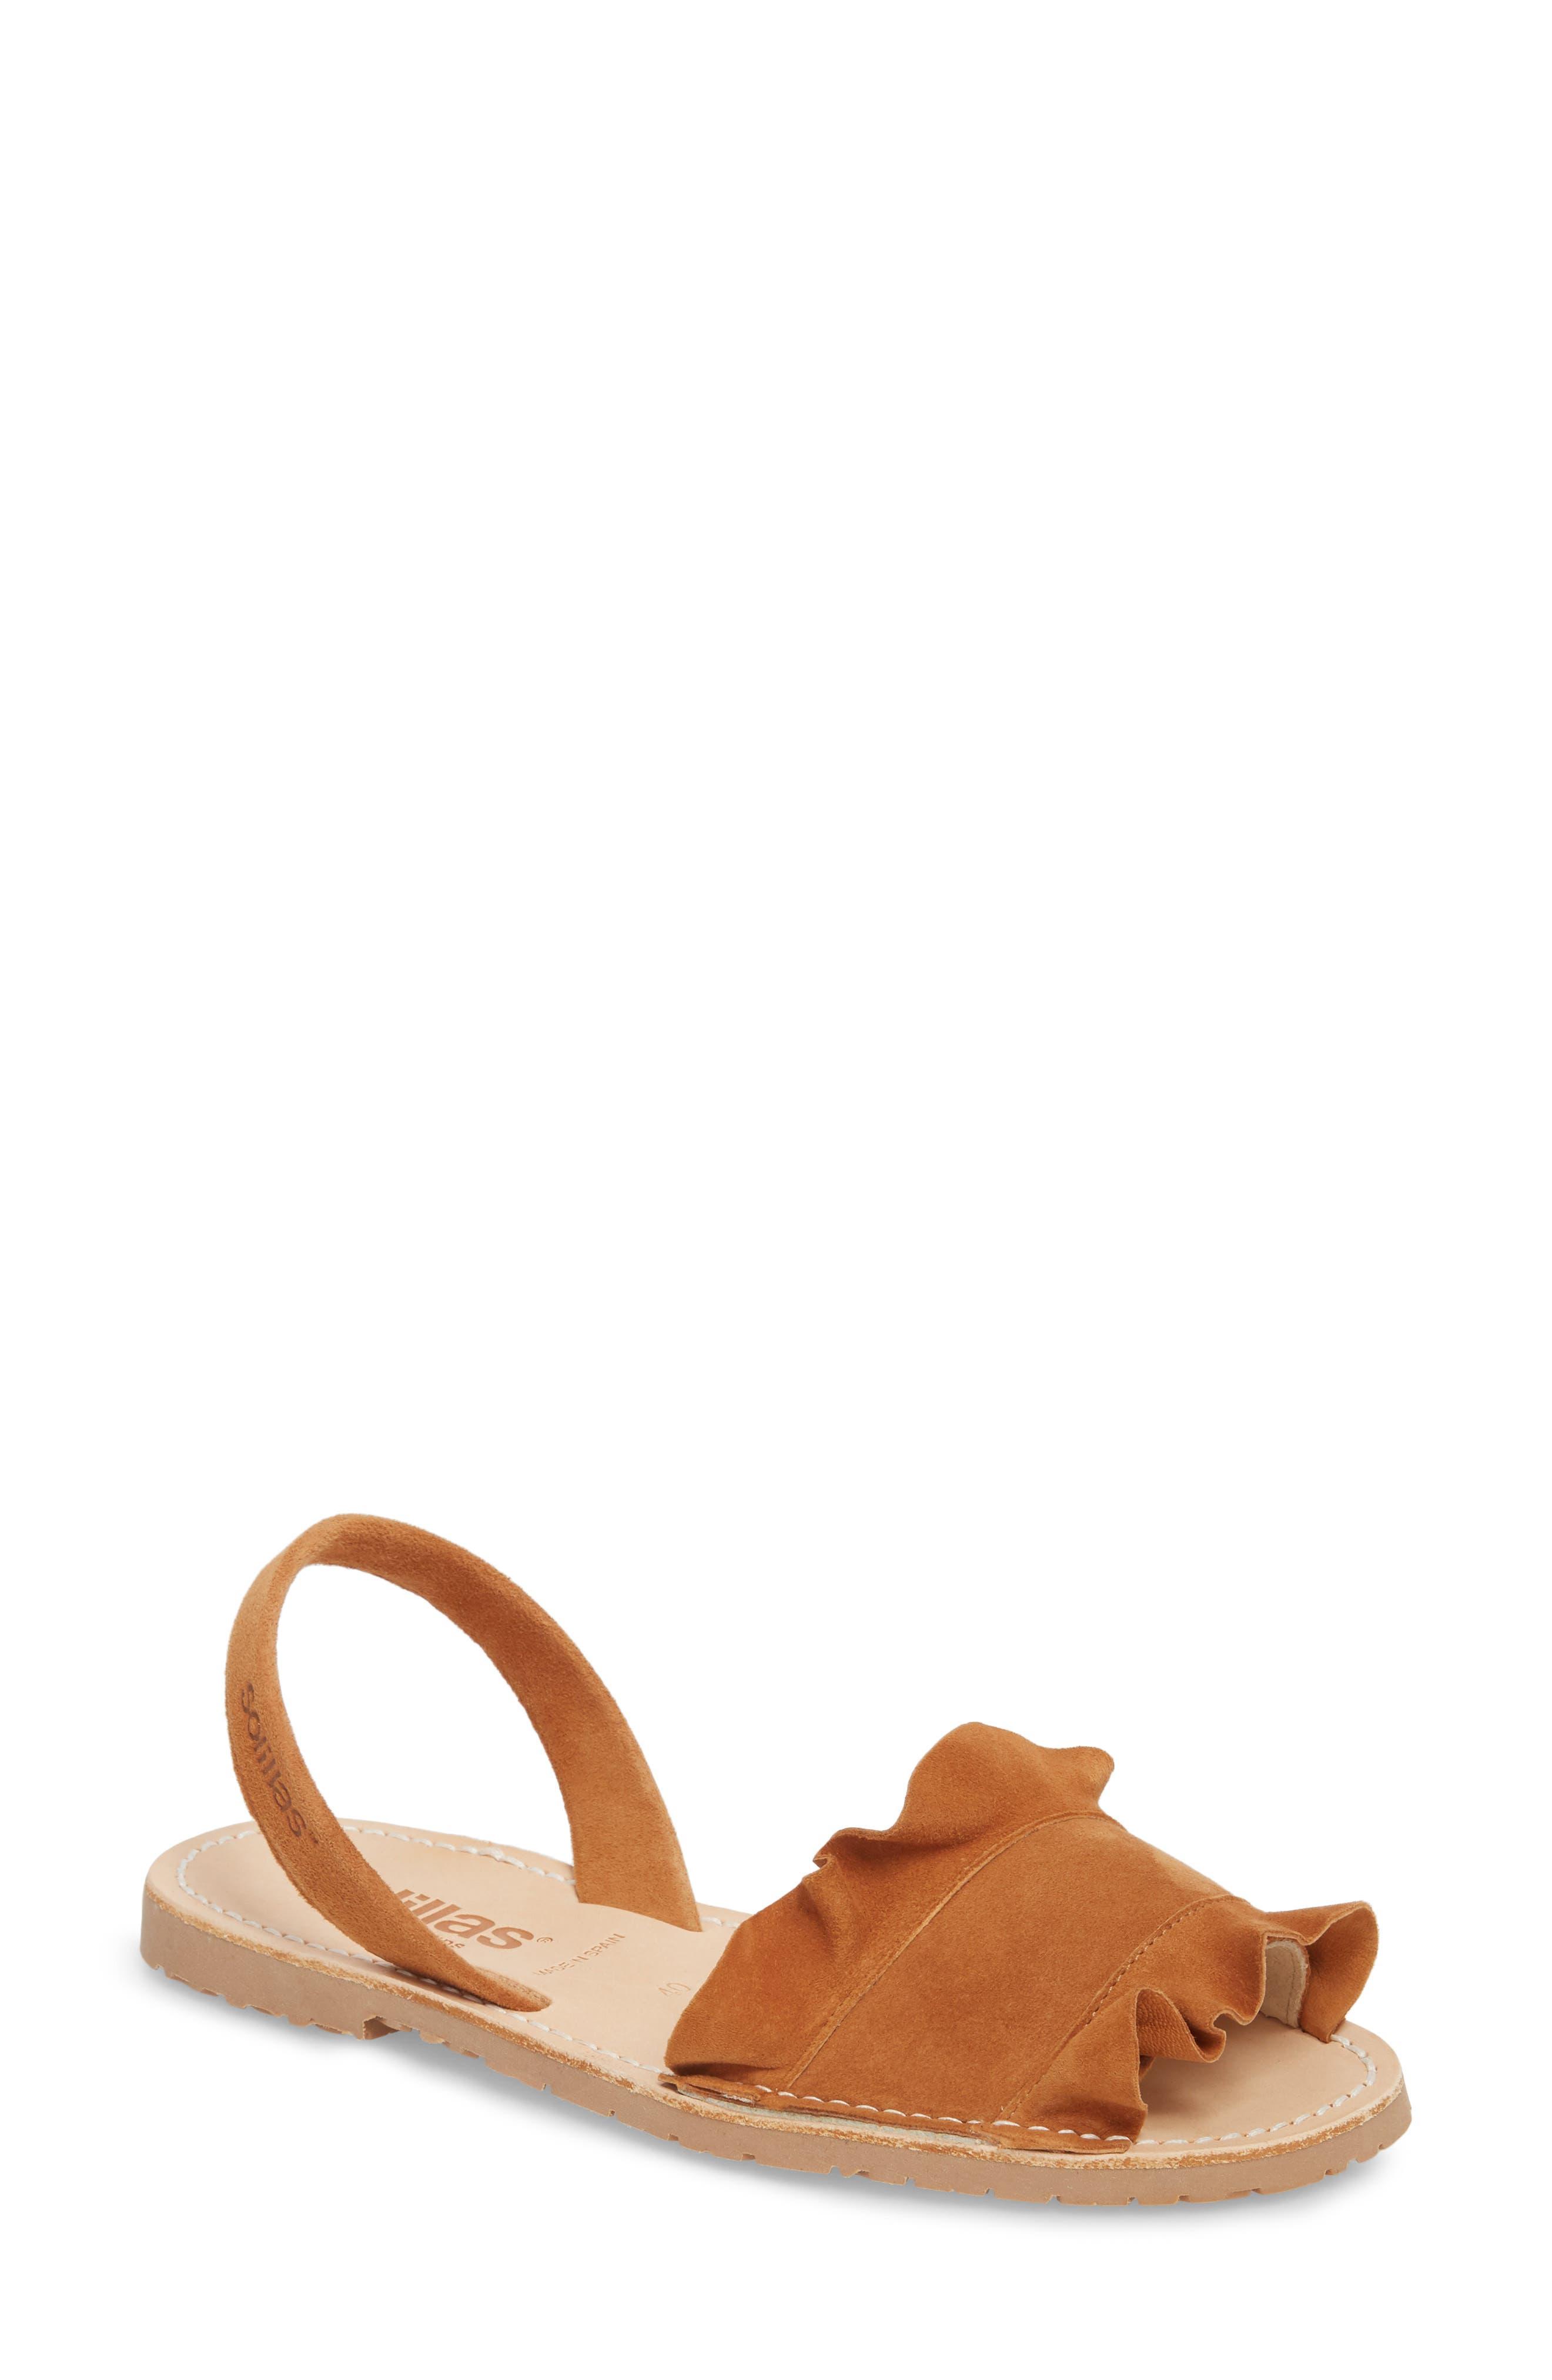 Frilled Flat Sandal,                         Main,                         color, Tan